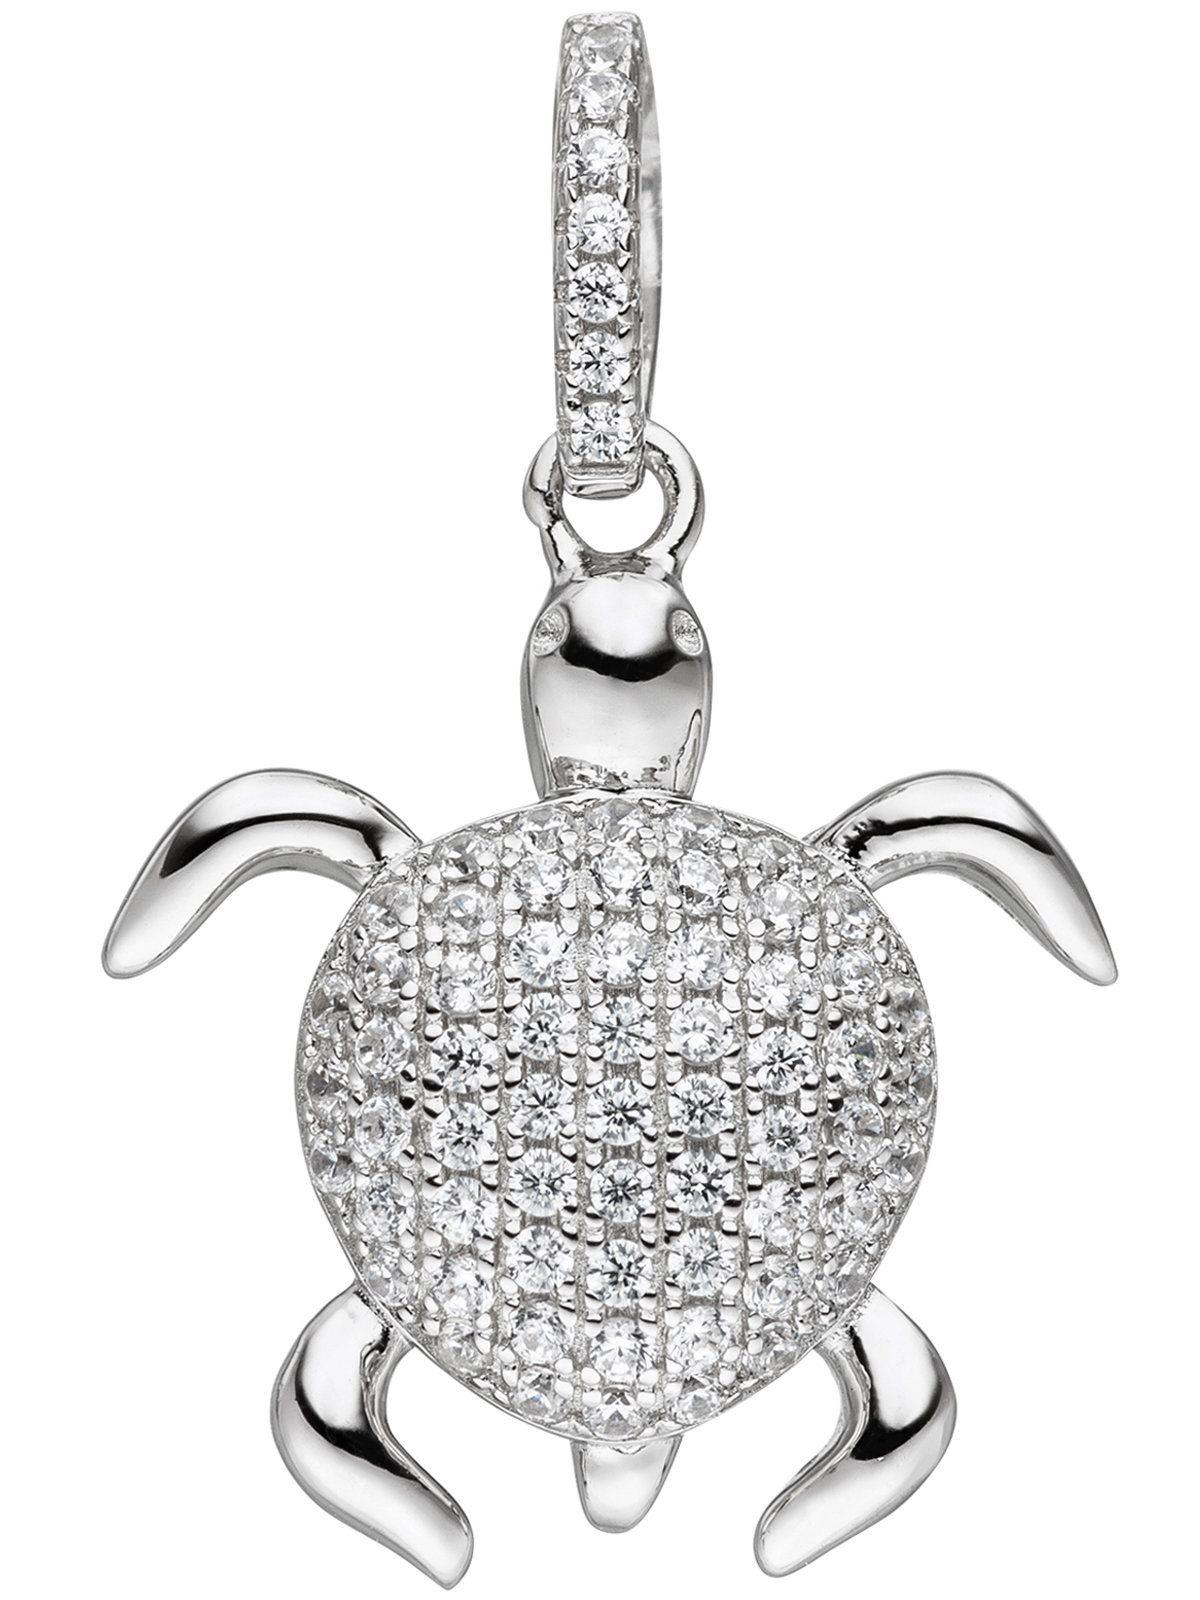 Adelia´s Kettenanhänger »Schildkröte Anhänger«, 925 Silber mit Zirkonia